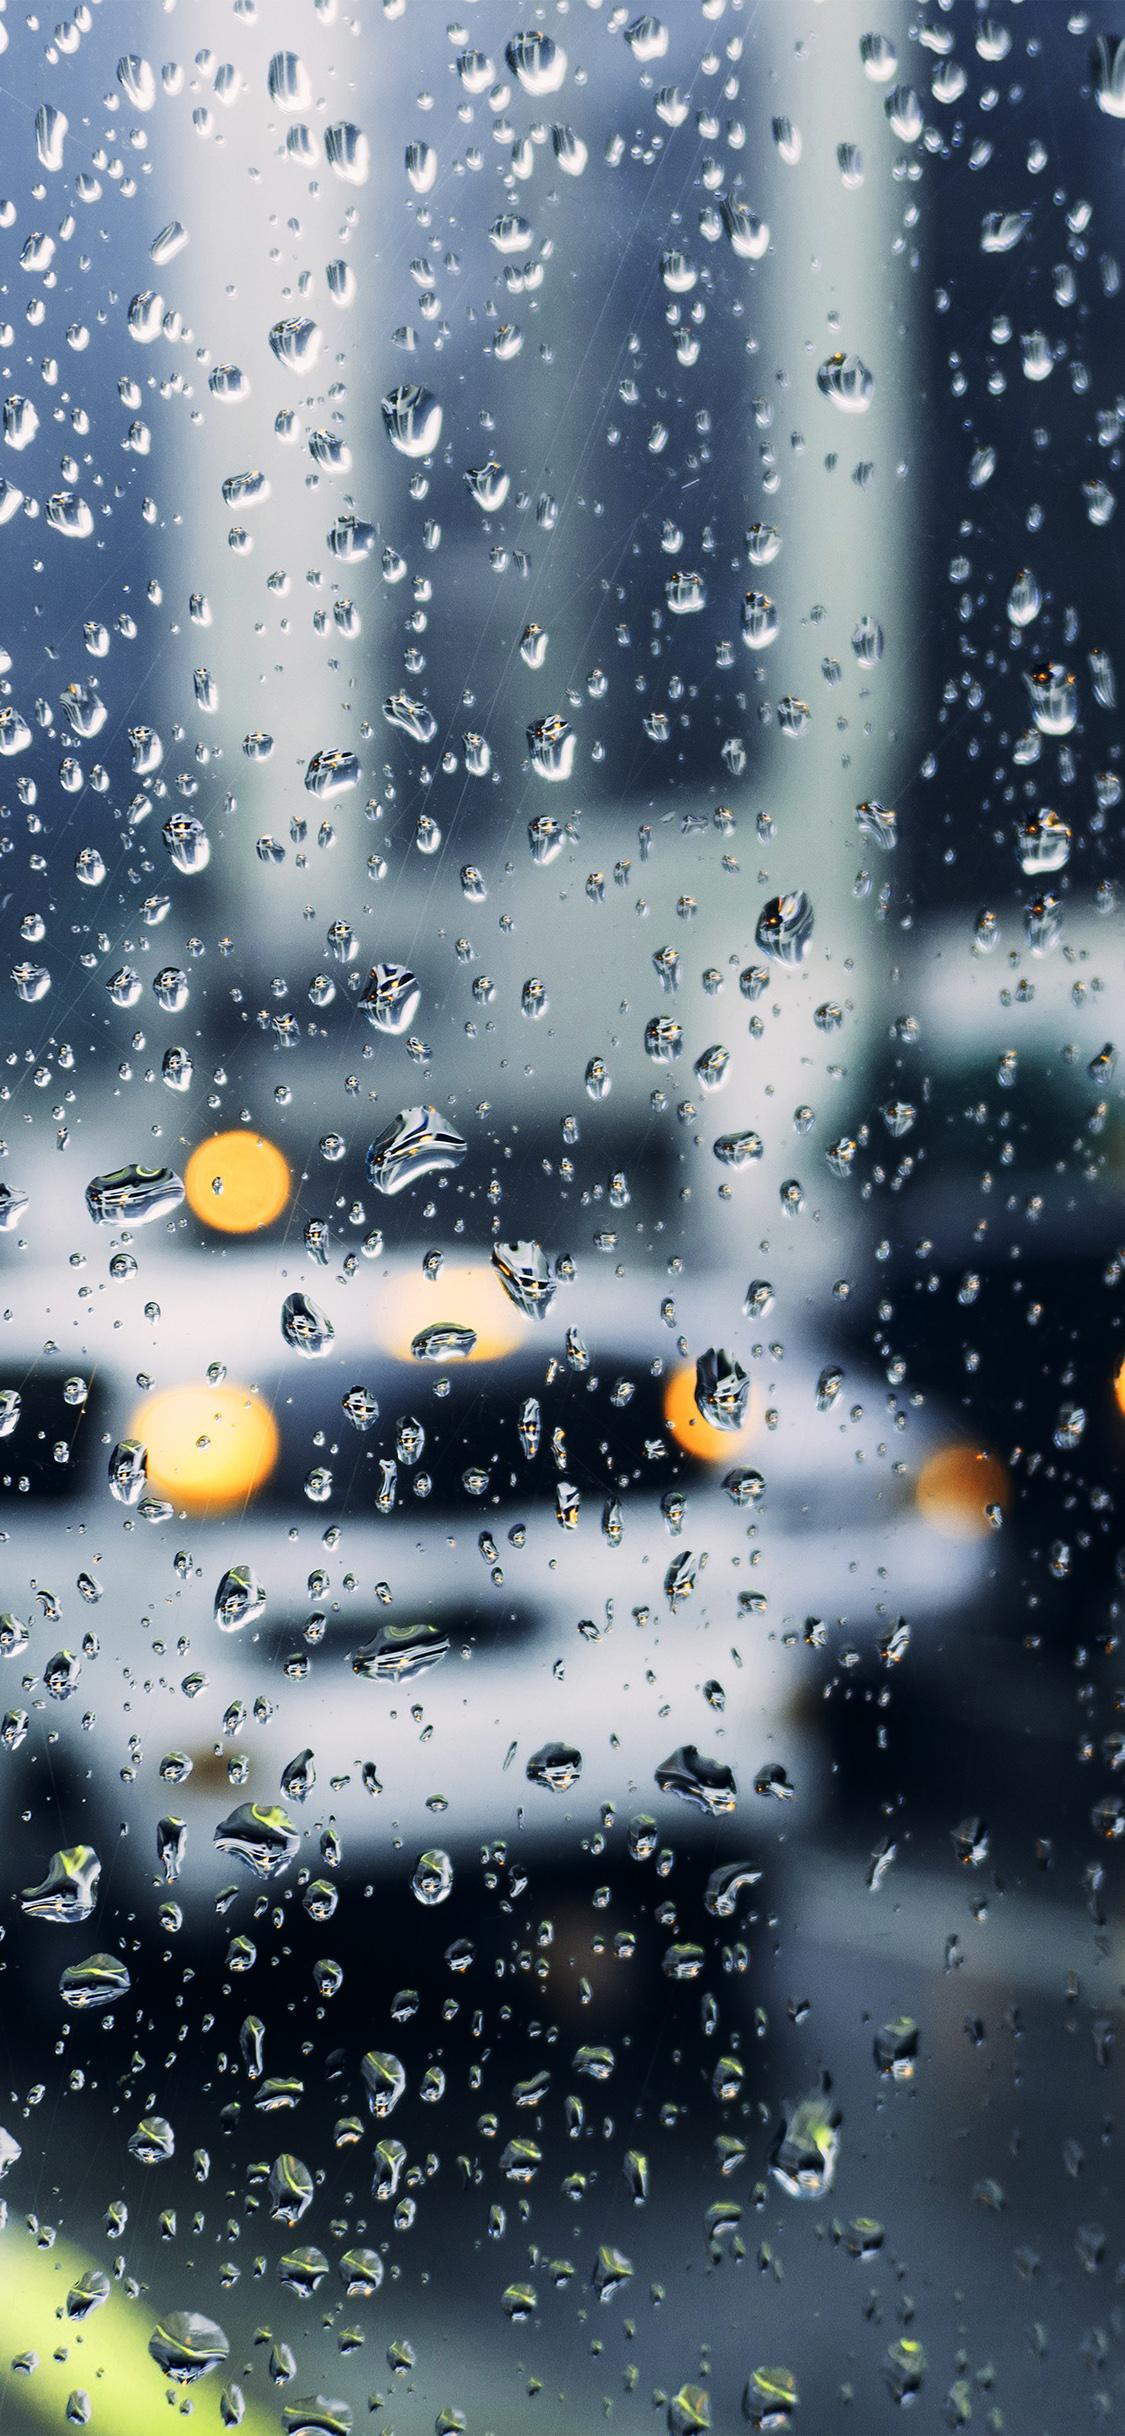 Papers Co Iphone Wallpaper Nj01 Rain Window Bokeh Art